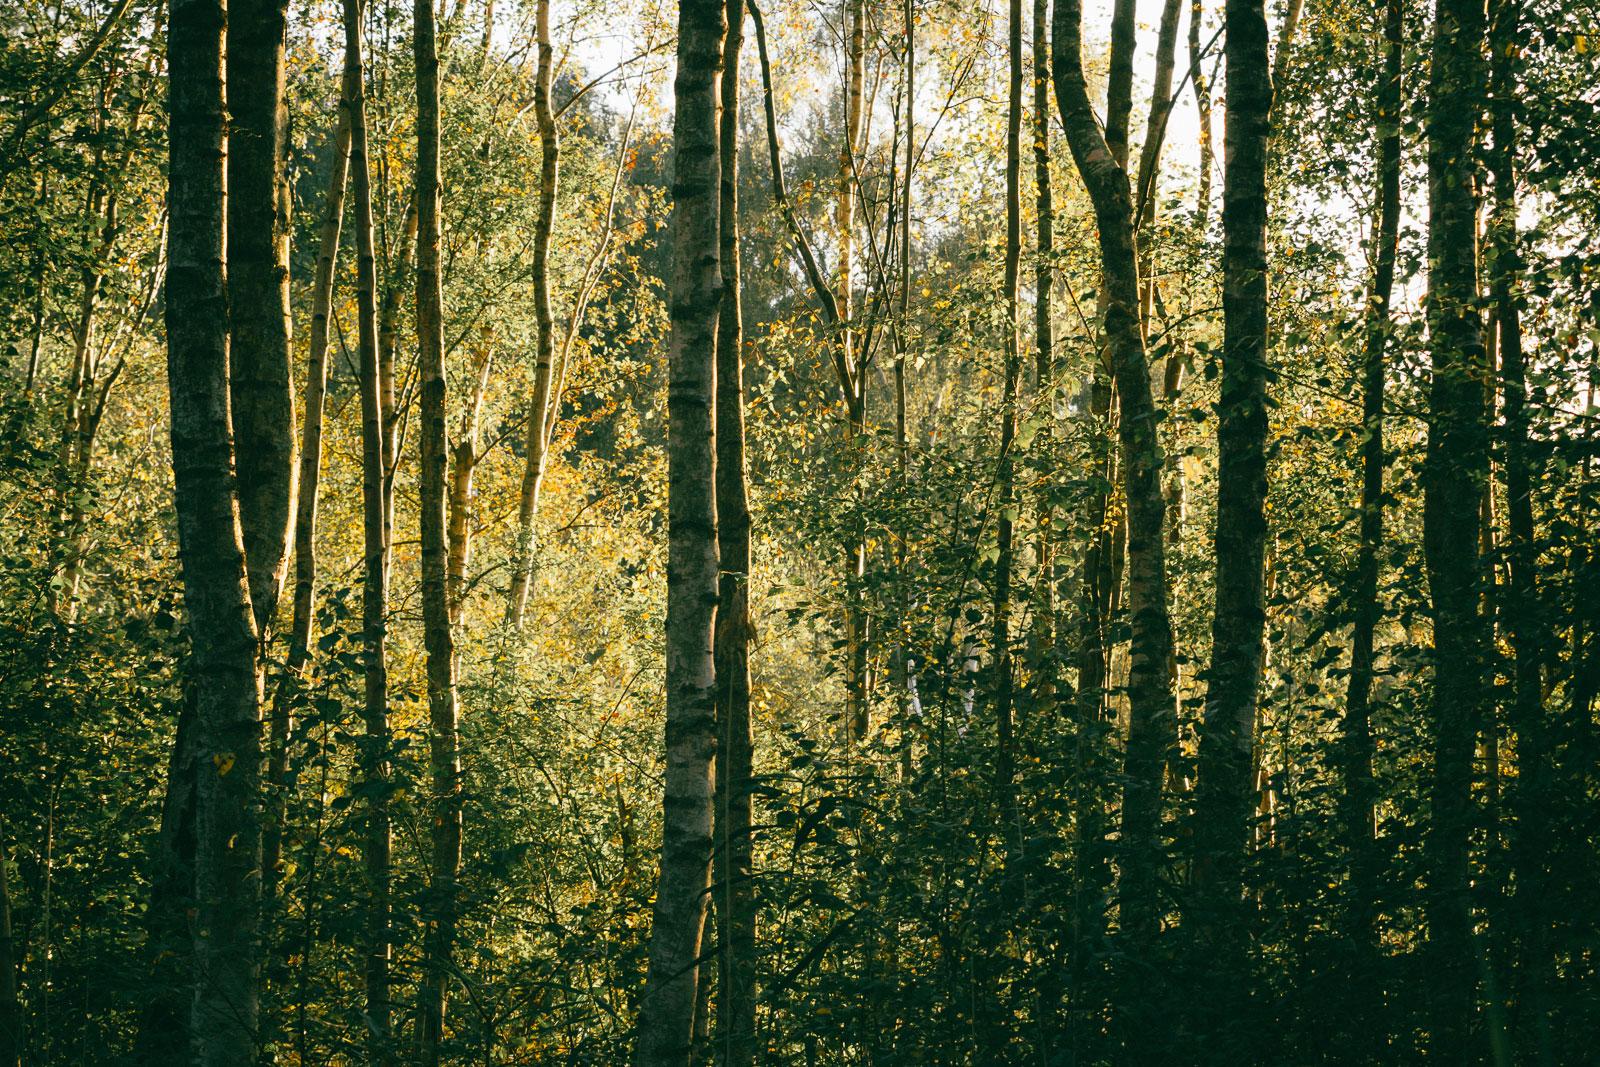 Holme Fen birches, forest, trees